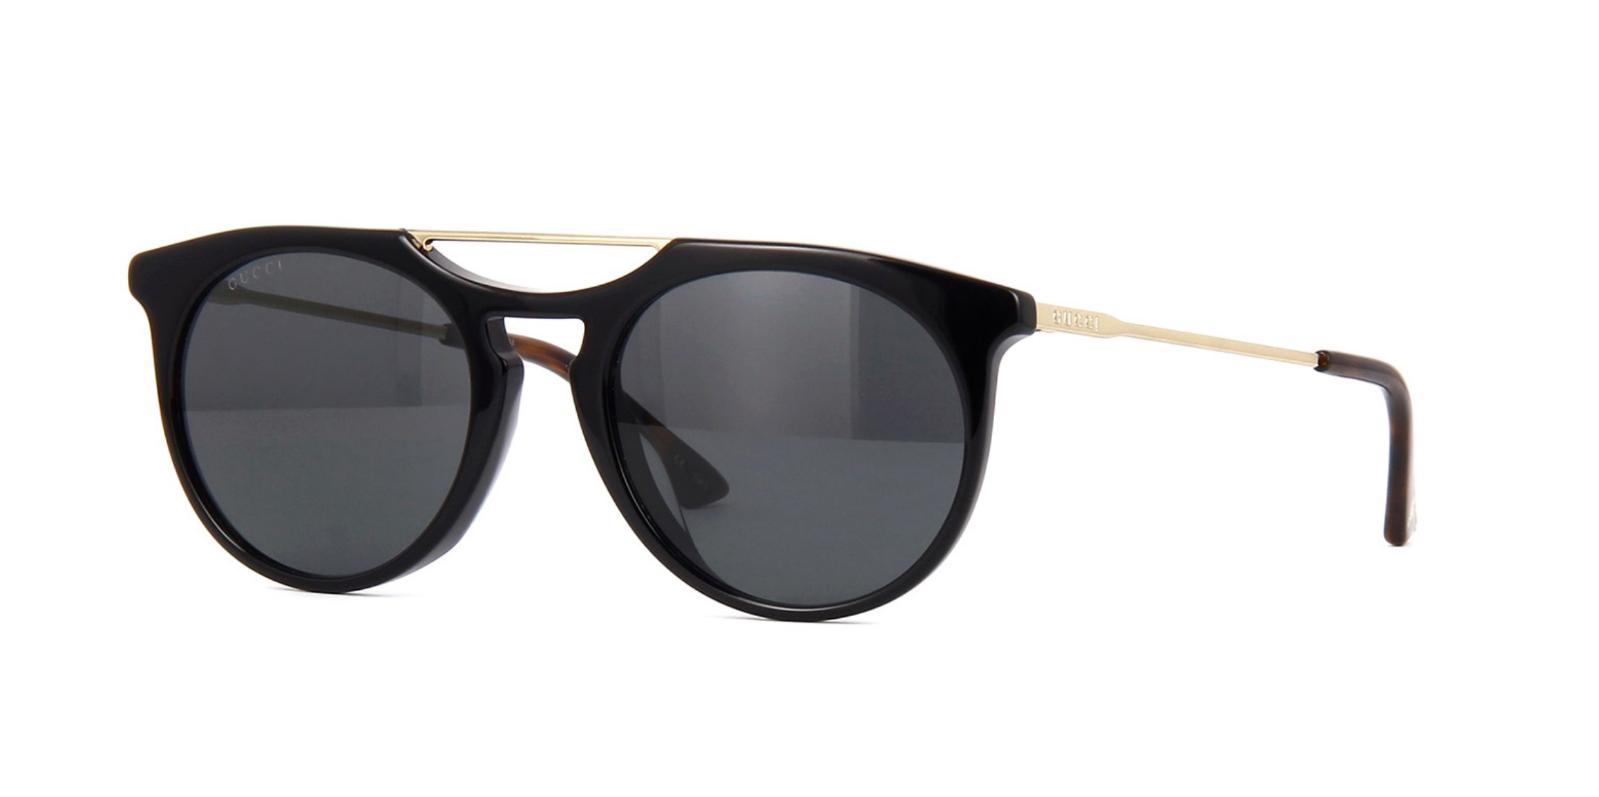 05bd0497bdc1 SmartBuyGlasses: Gucci GG0014S 002 60 New Men Sunglasses   Rakuten.com